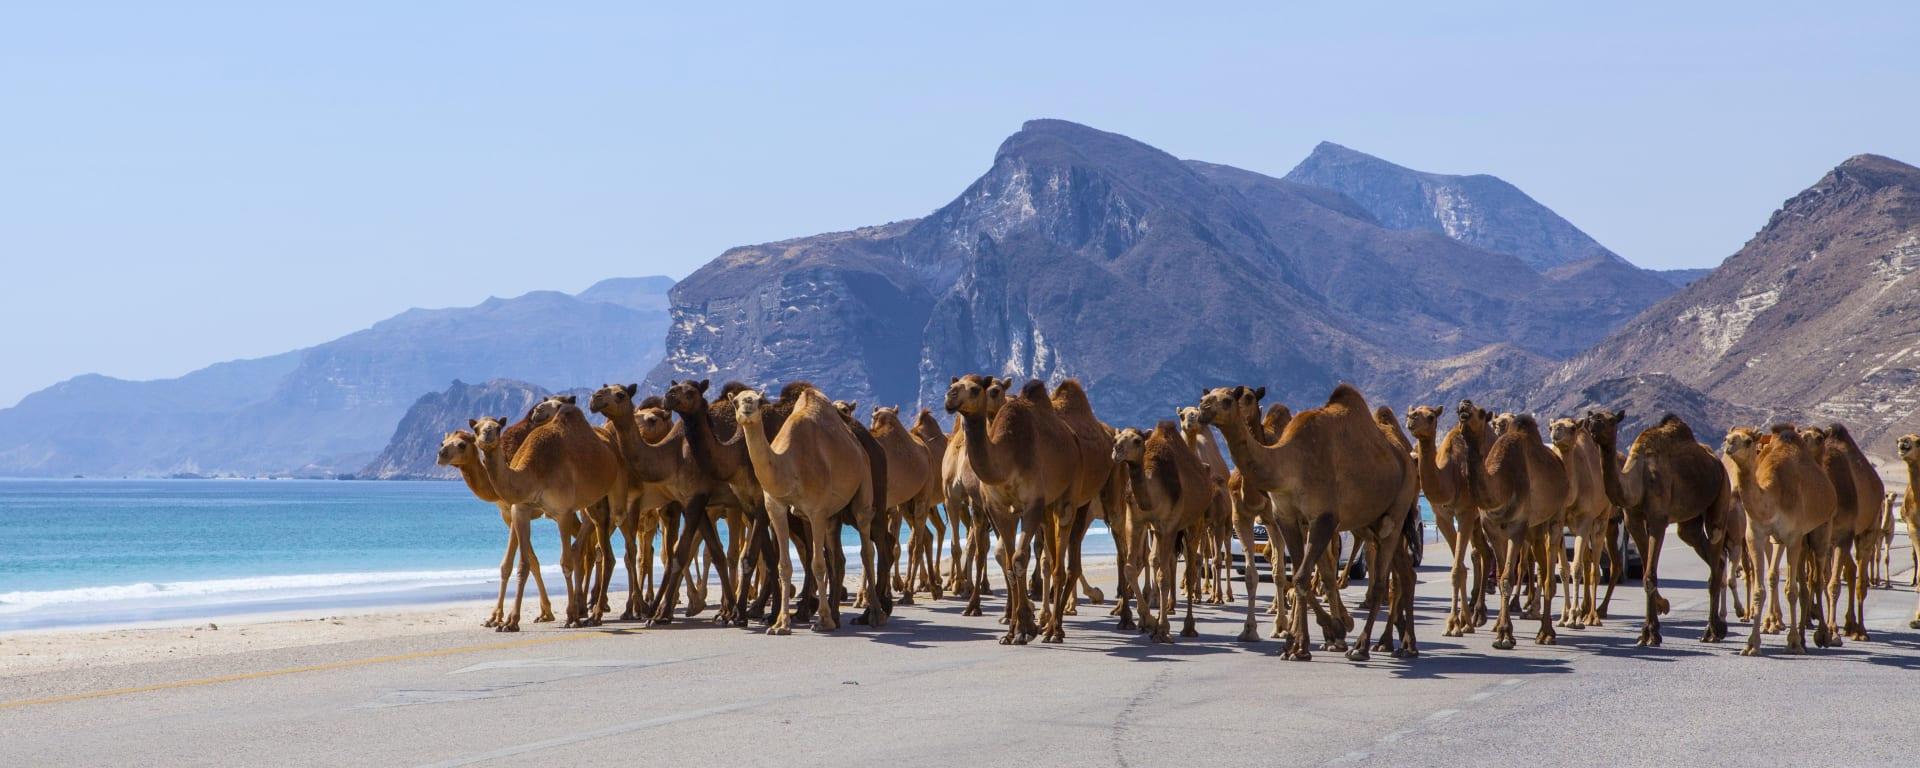 Abenteuer Dhofar - Küste & Wüste ab Salalah: Oman Salalah Kamele am Strand